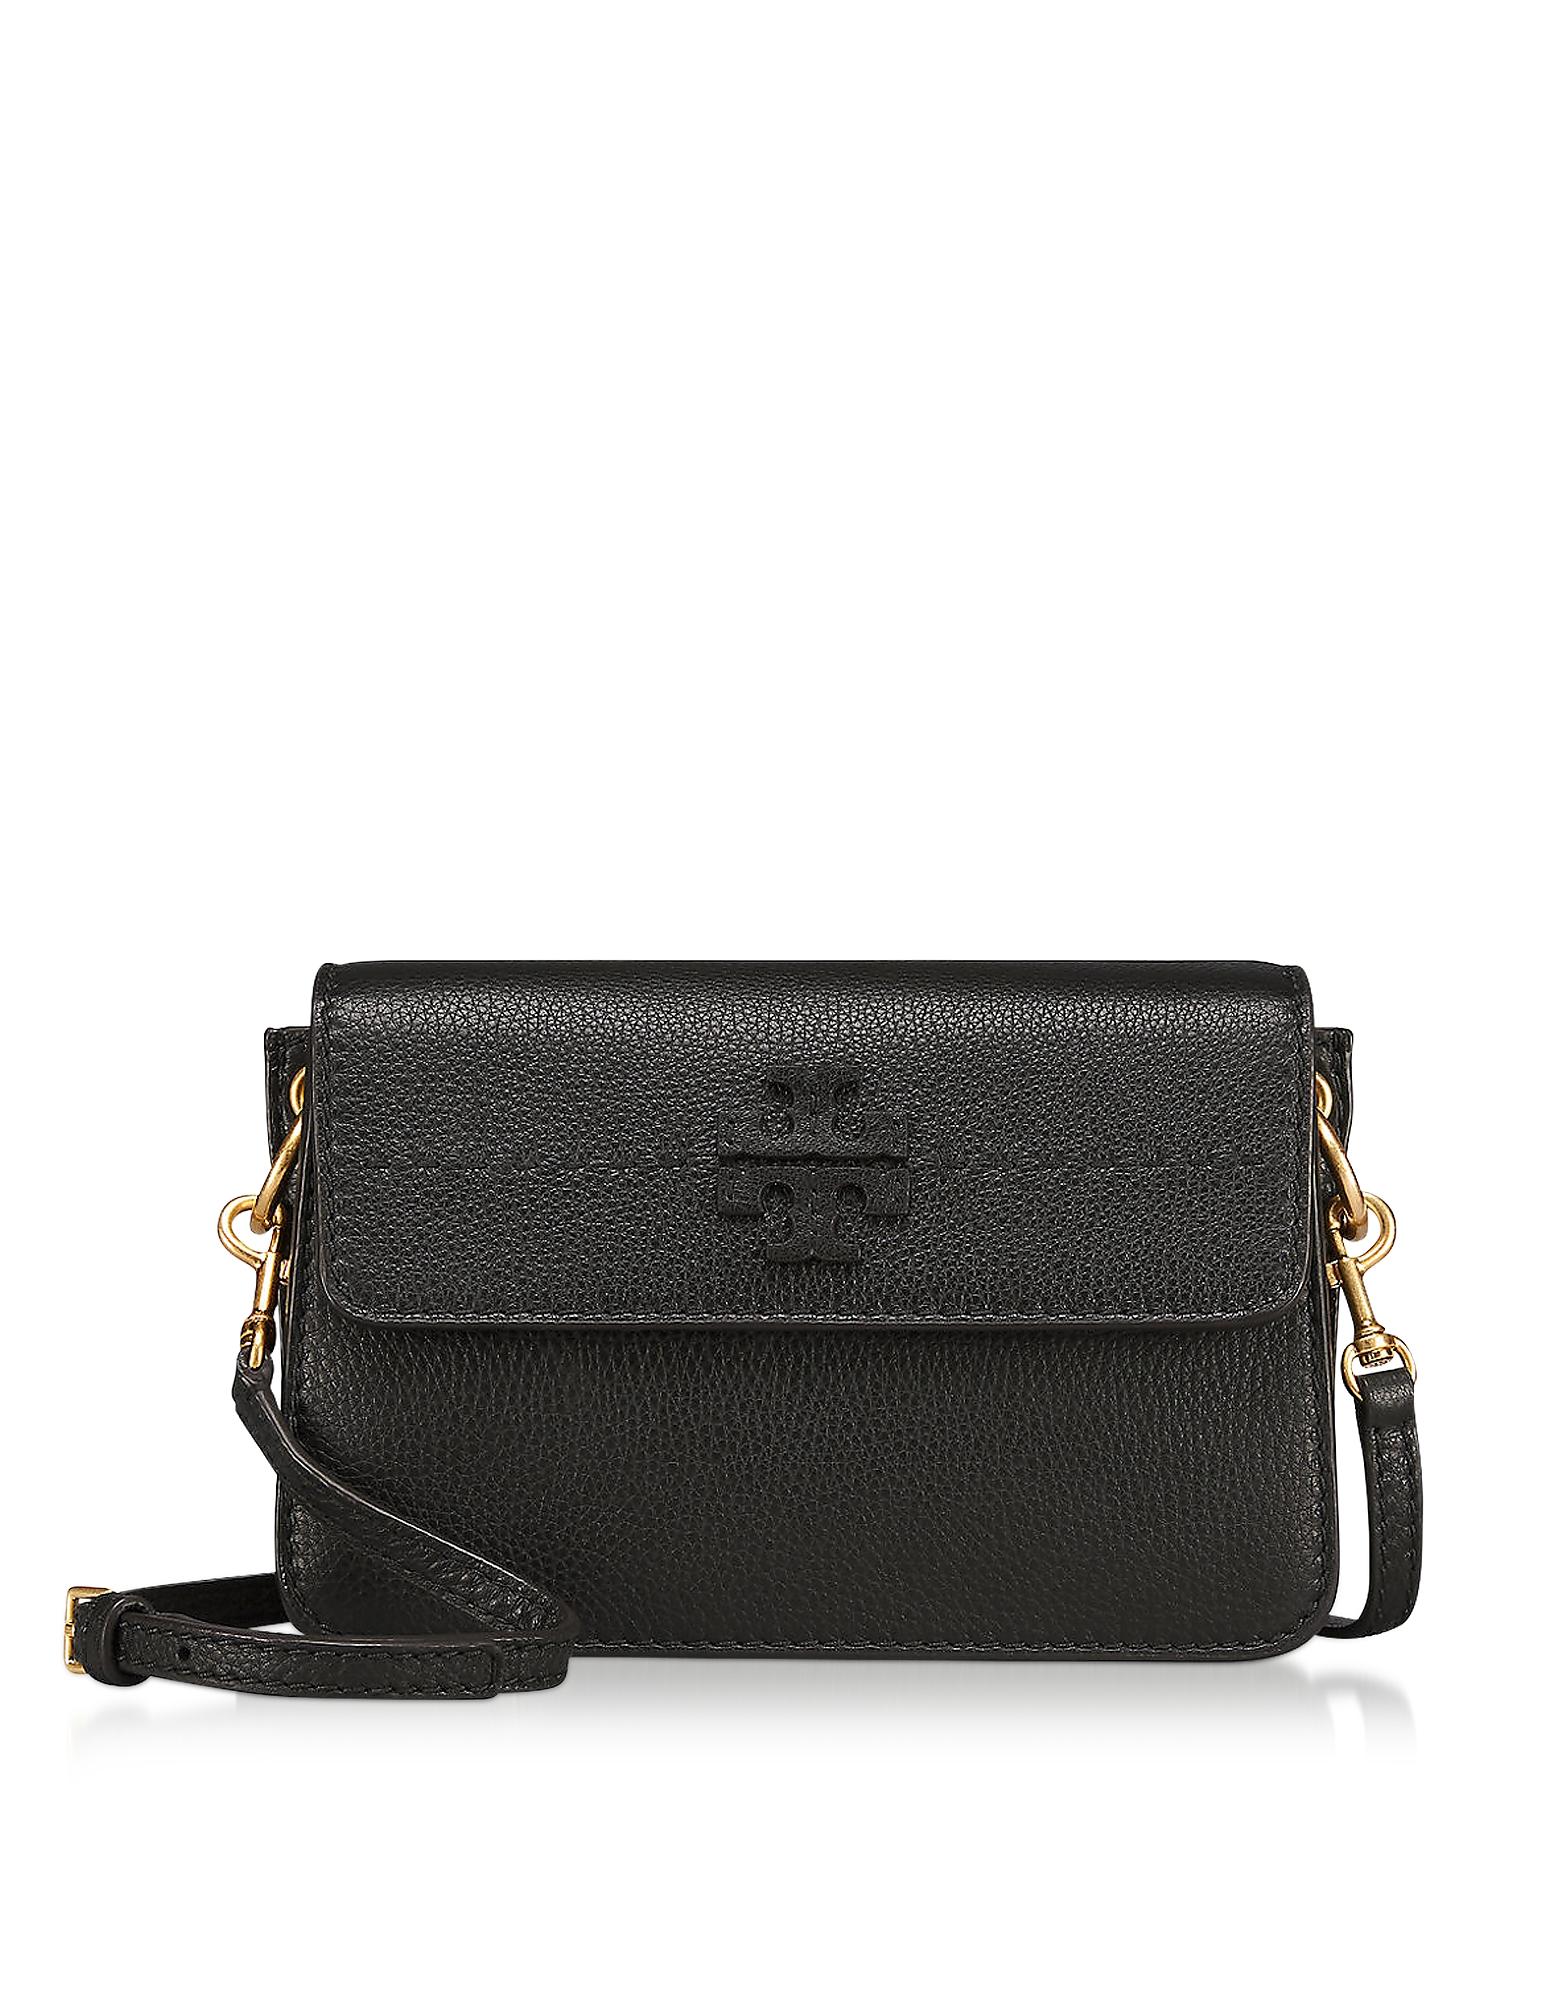 Tory Burch - McGraw Black Pebbled Leather Crossbody Bag  dcba5ffb84d99